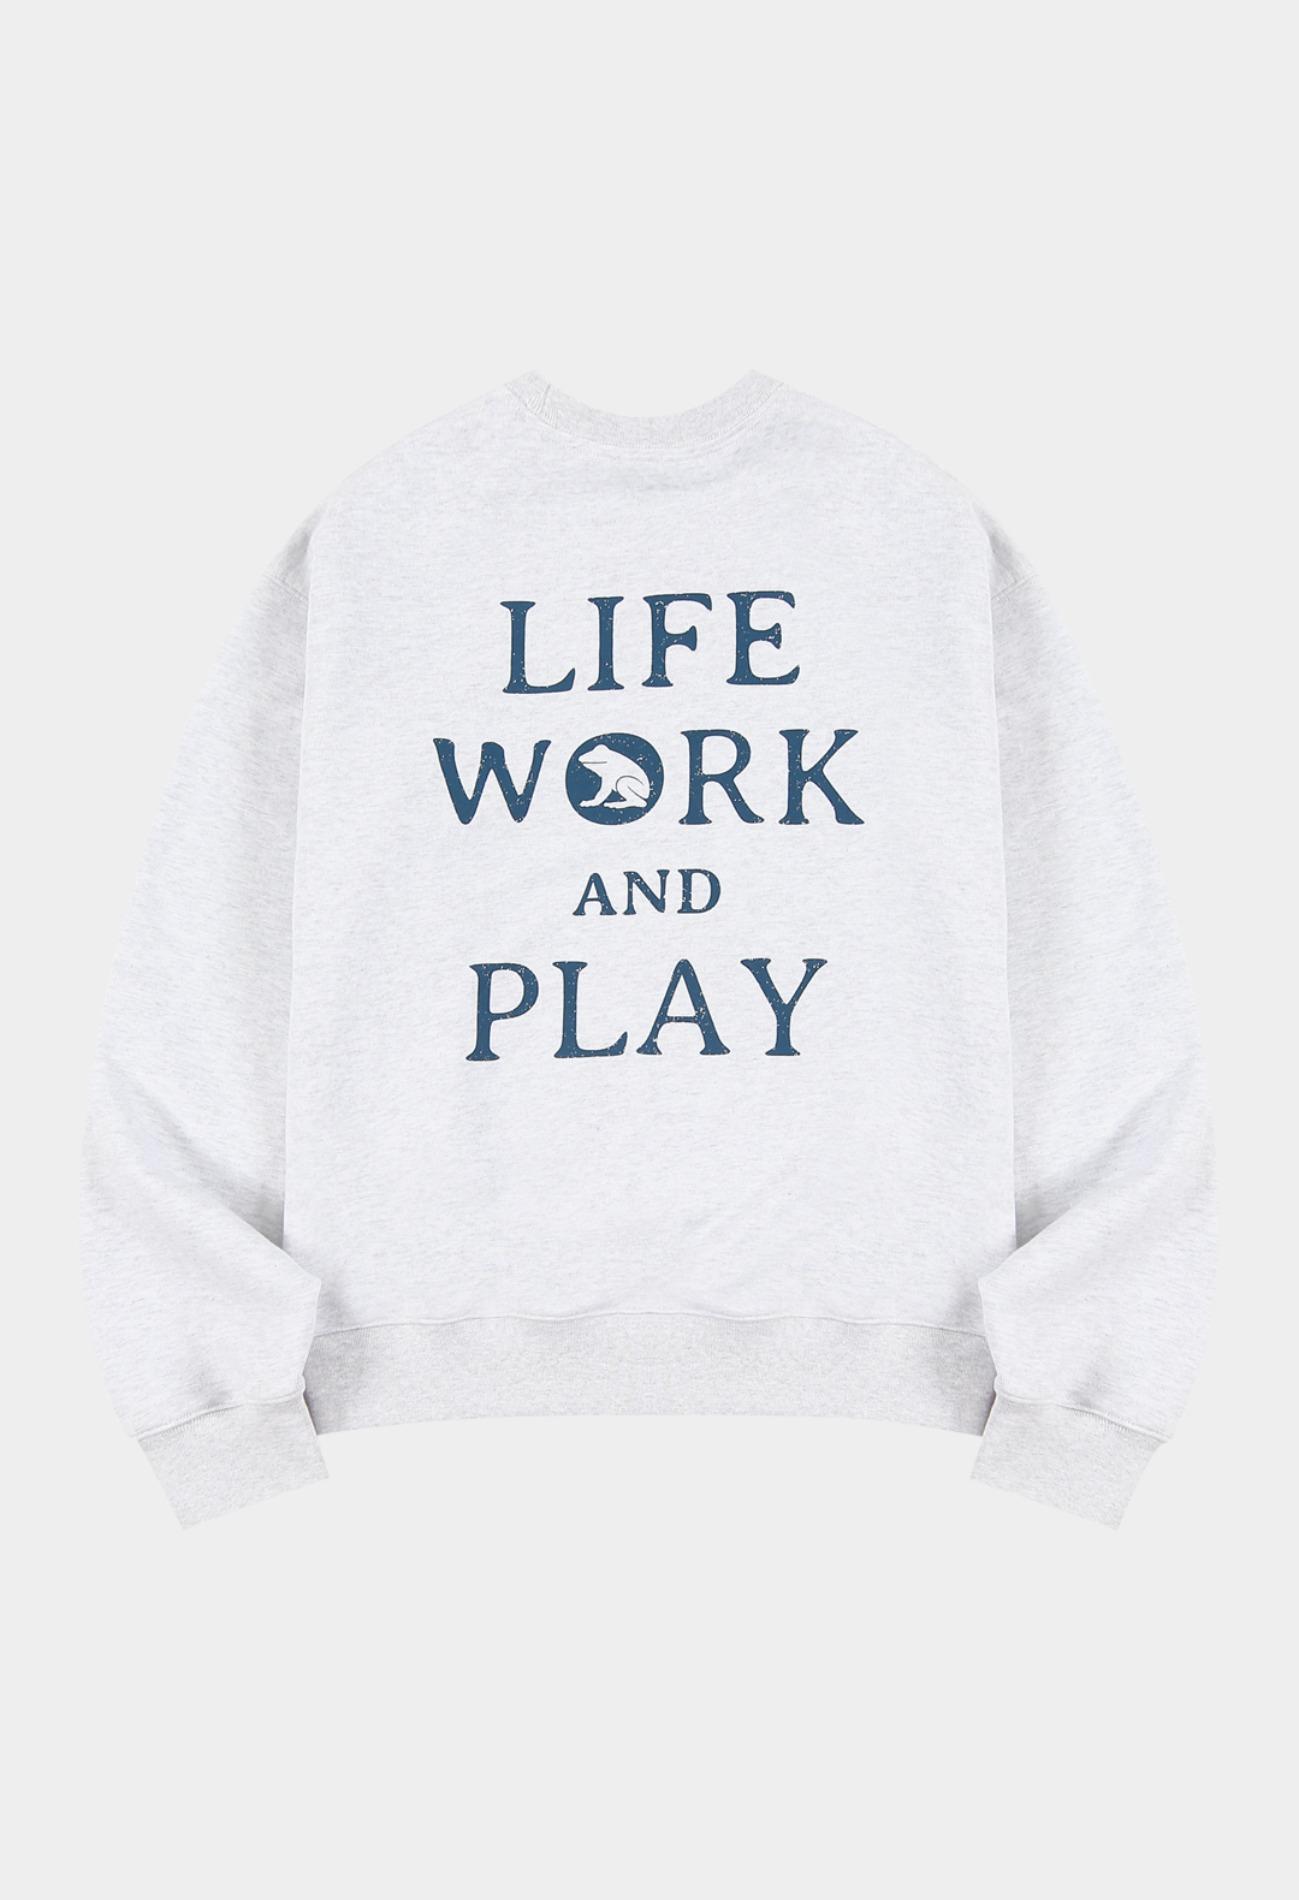 keek Pigment Sweatshirts by KEEK CREW - M.White 스트릿패션 유니섹스브랜드 커플시밀러룩 남자쇼핑몰 여성의류쇼핑몰 후드티 힙색